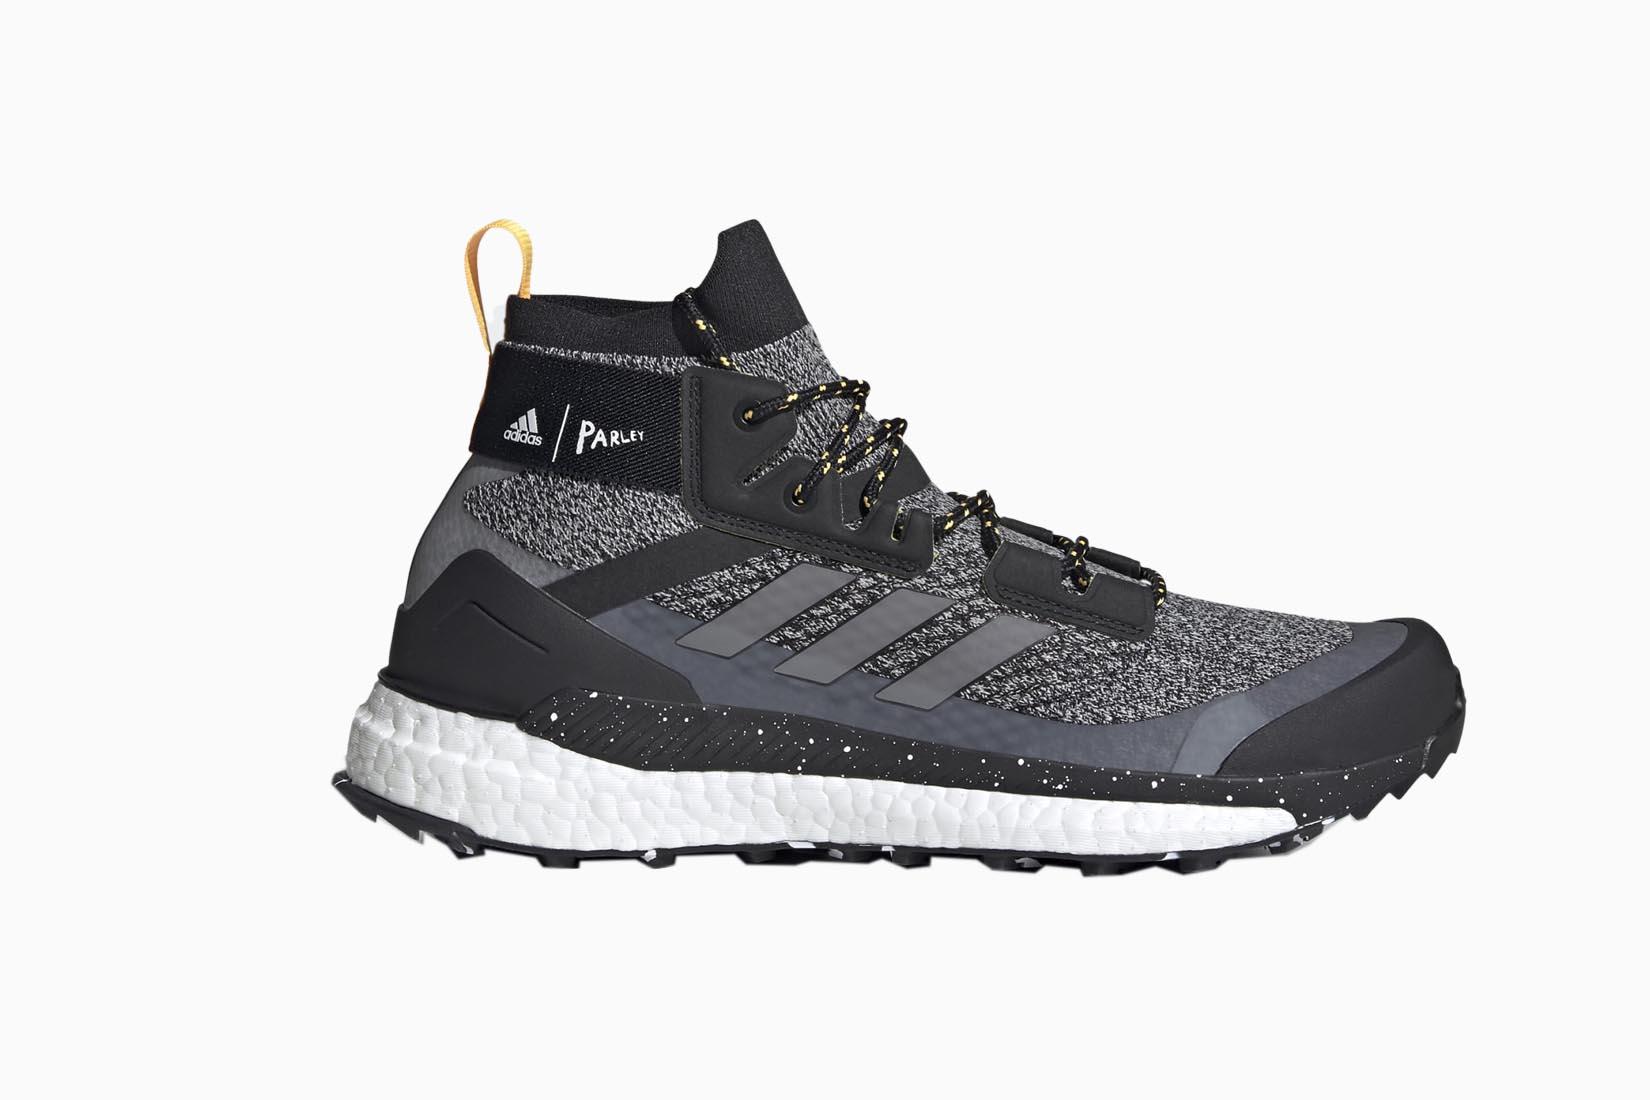 best boots men adidas terrex hiking boot review Luxe Digital